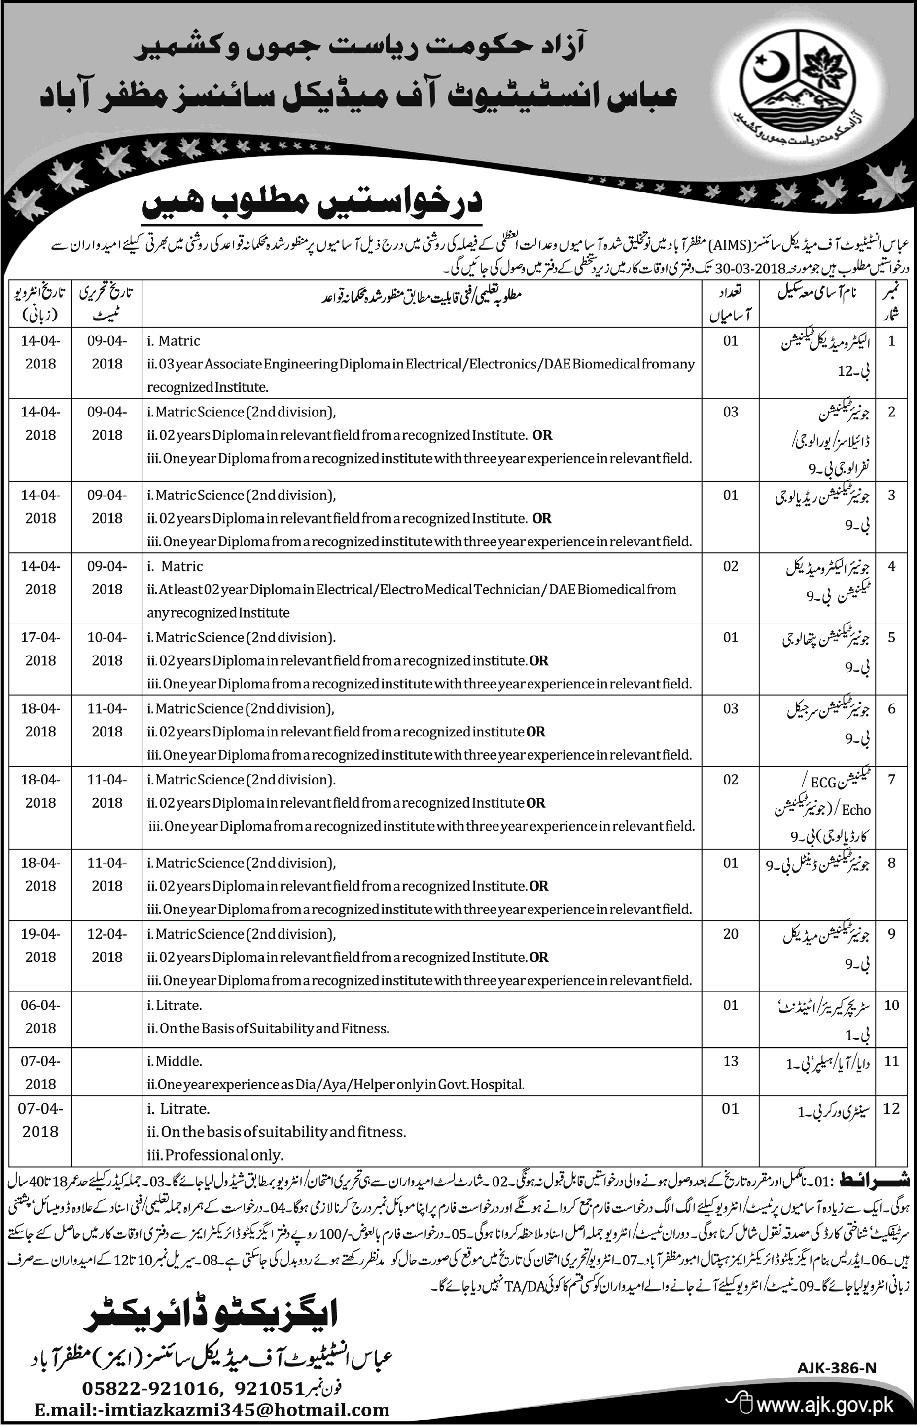 Jobs in Abbas Institute of Medical Sciences Muzaffarabad Daily Ausaf Newspaper 15 March 2018